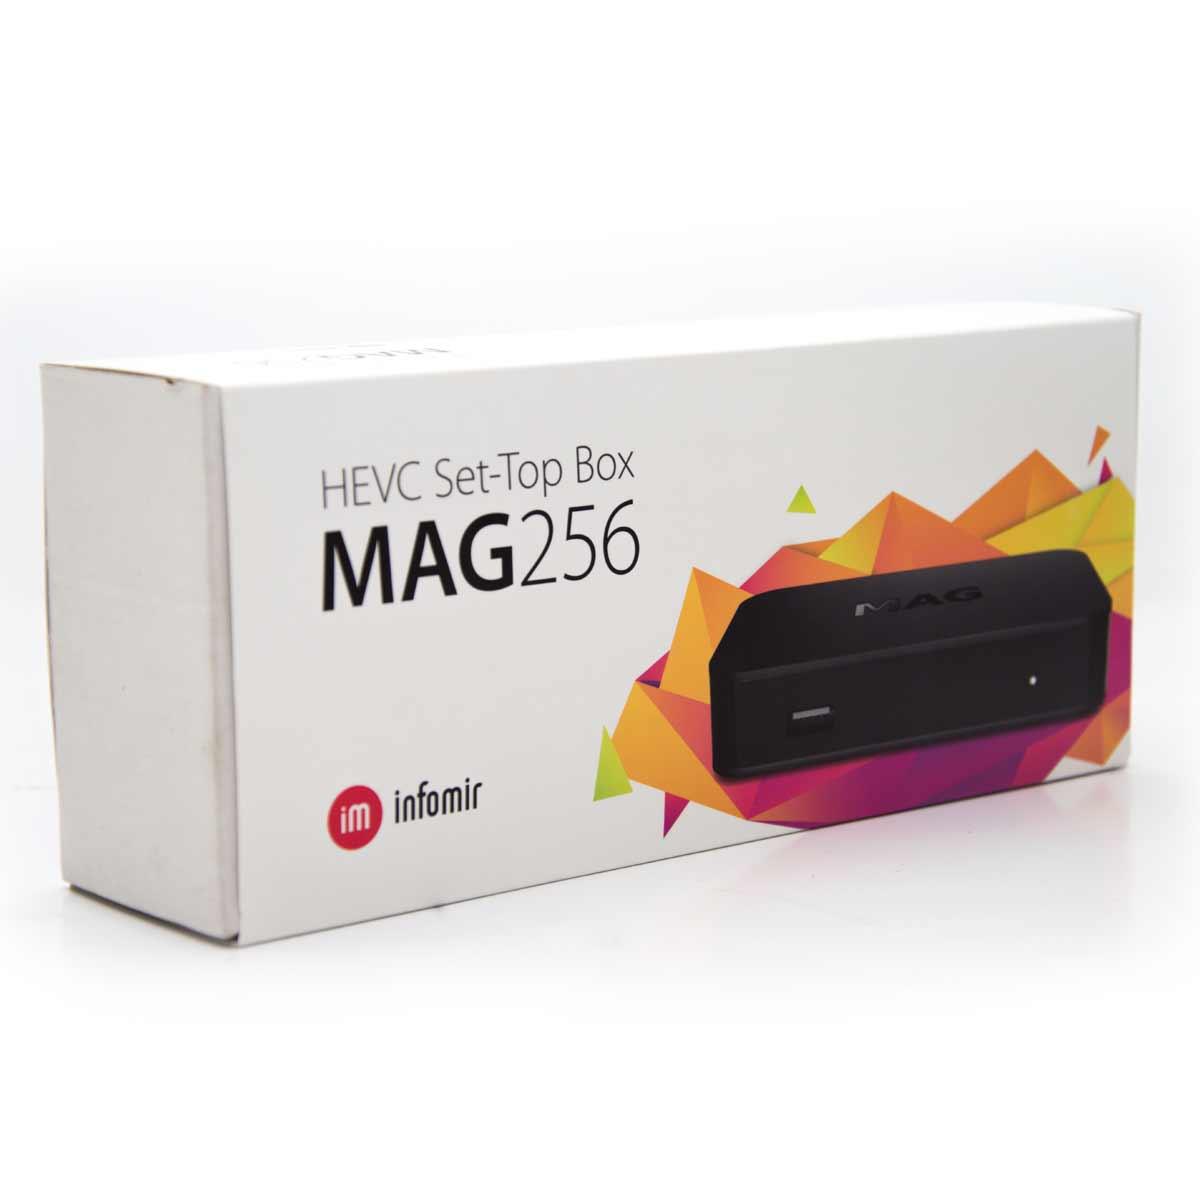 5x MAG 256 original HEVC Set-Top Box IPTV Multimedia Player Internet TV IP Linux Receiver H.265 Infomir